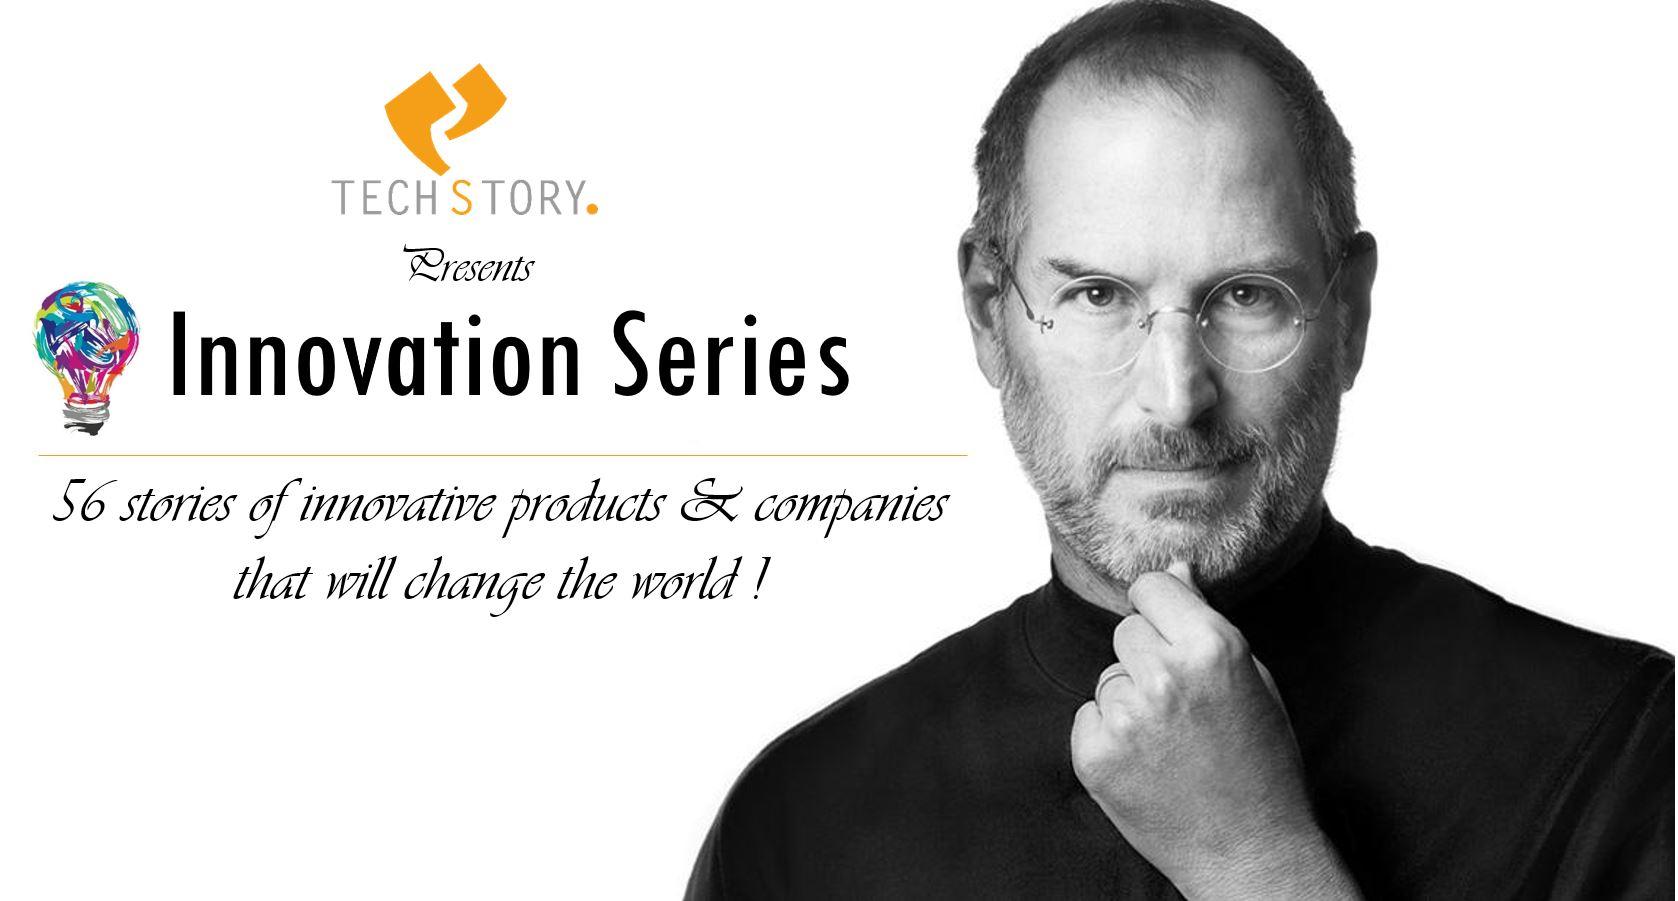 steve jobs the great innovator Steve jobs is one of the great innovators in the history of modern capitalism,  new york times columnist joe nocera told cnn's piers morgan.